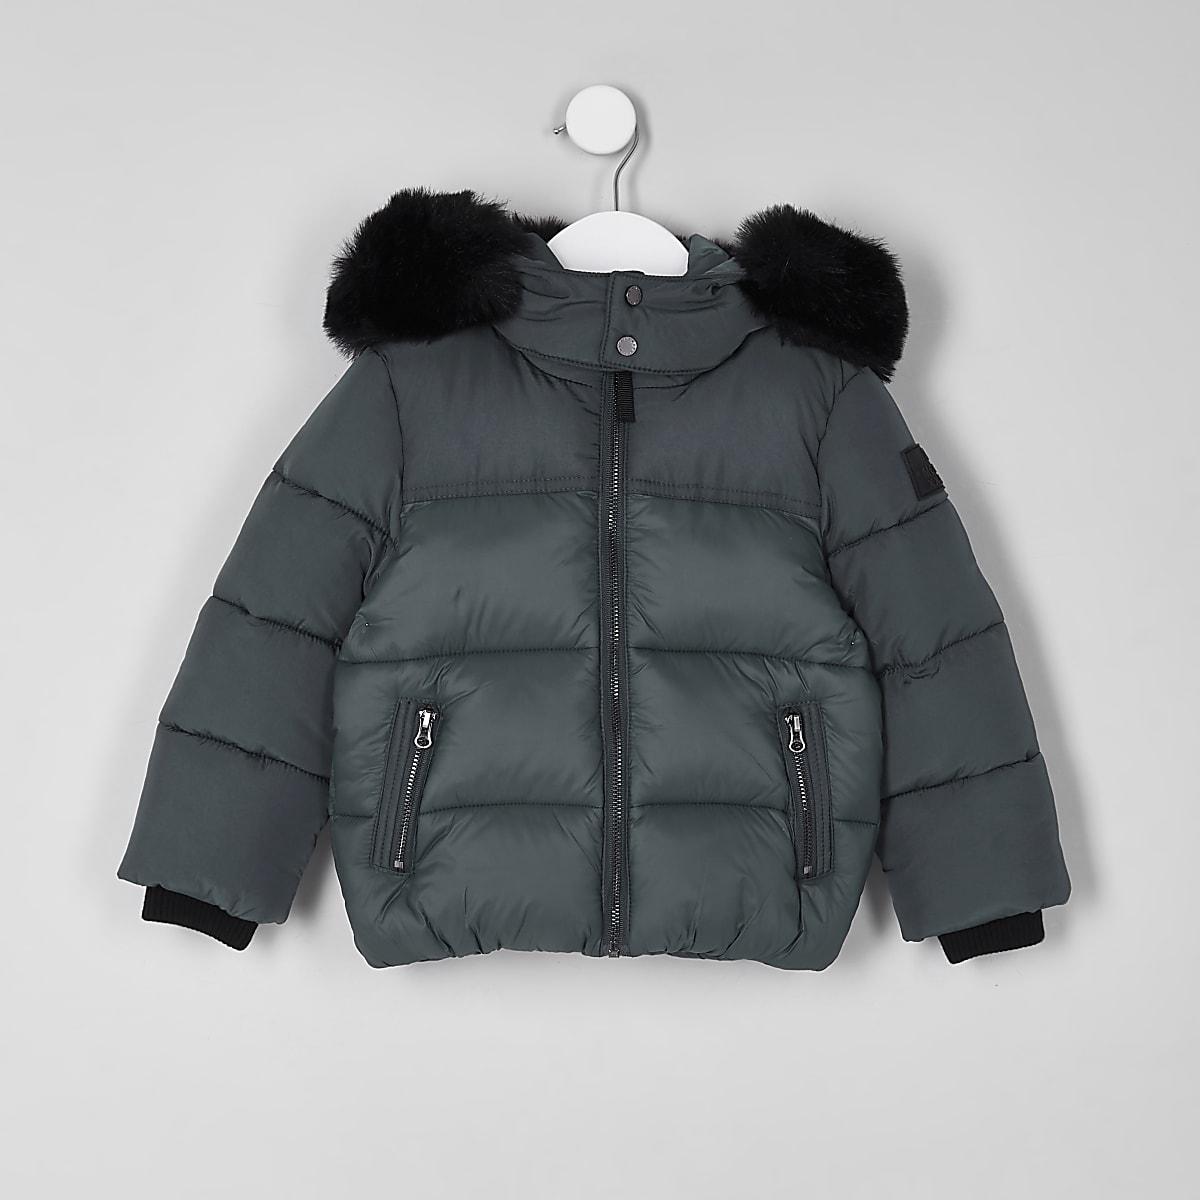 a0bebd3a1 Mini boys green faux fur hood puffer coat - Baby Boys Coats ...